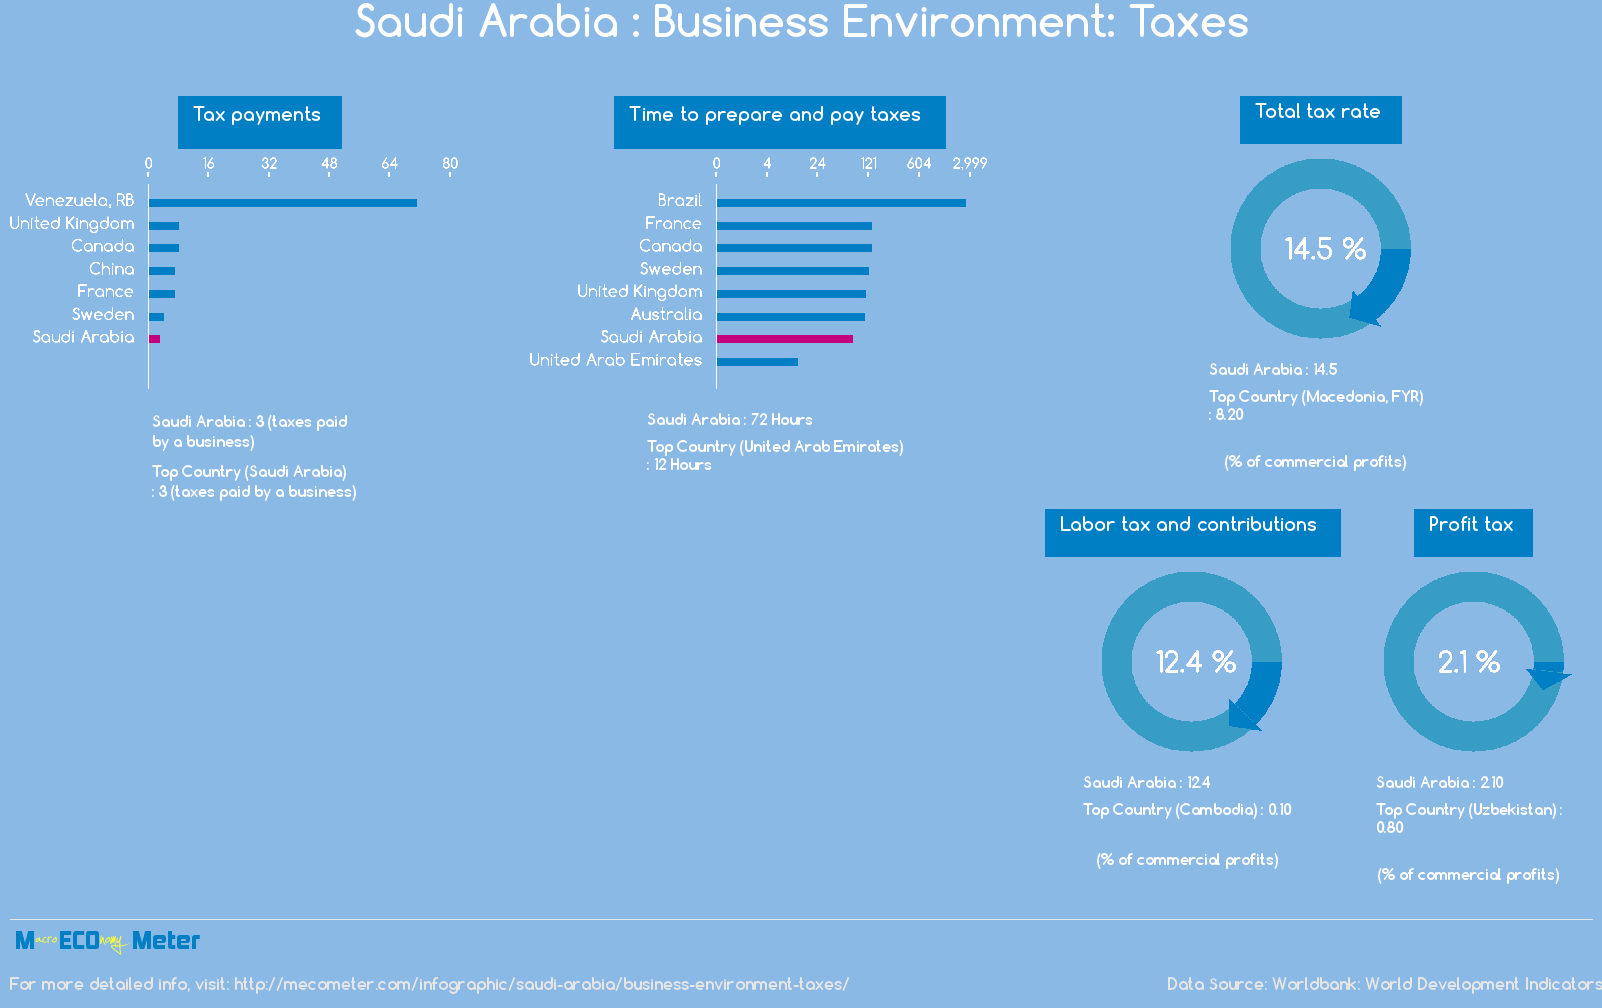 Saudi Arabia : Business Environment: Taxes